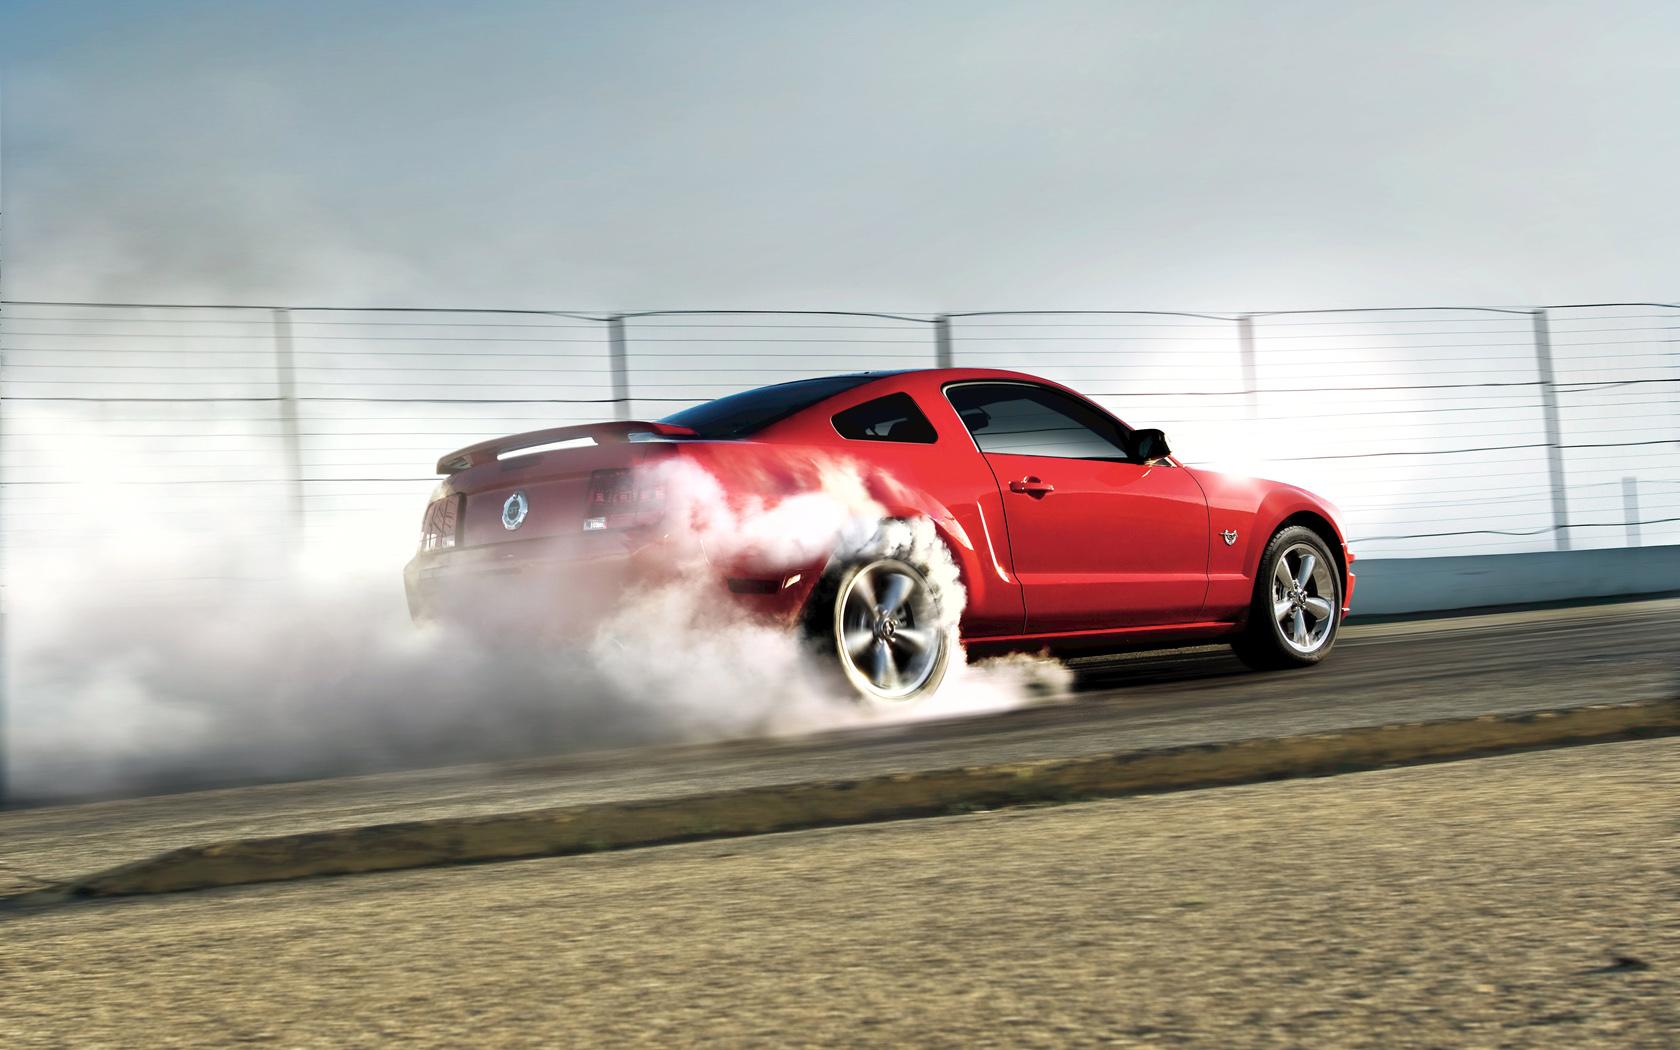 Mustang Gt Burnout